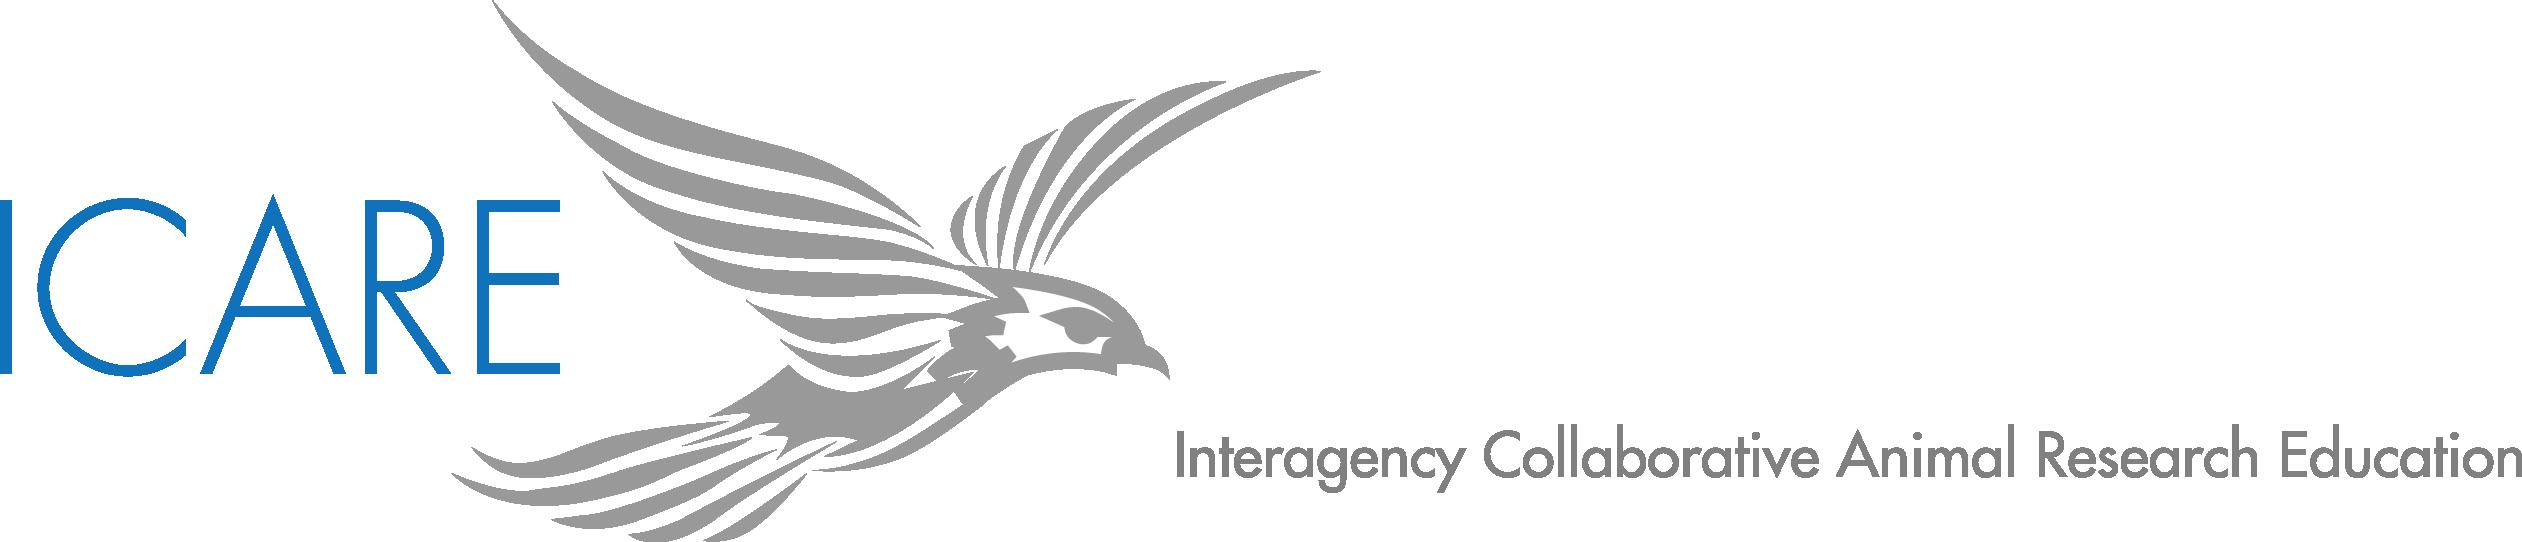 ICARE logo